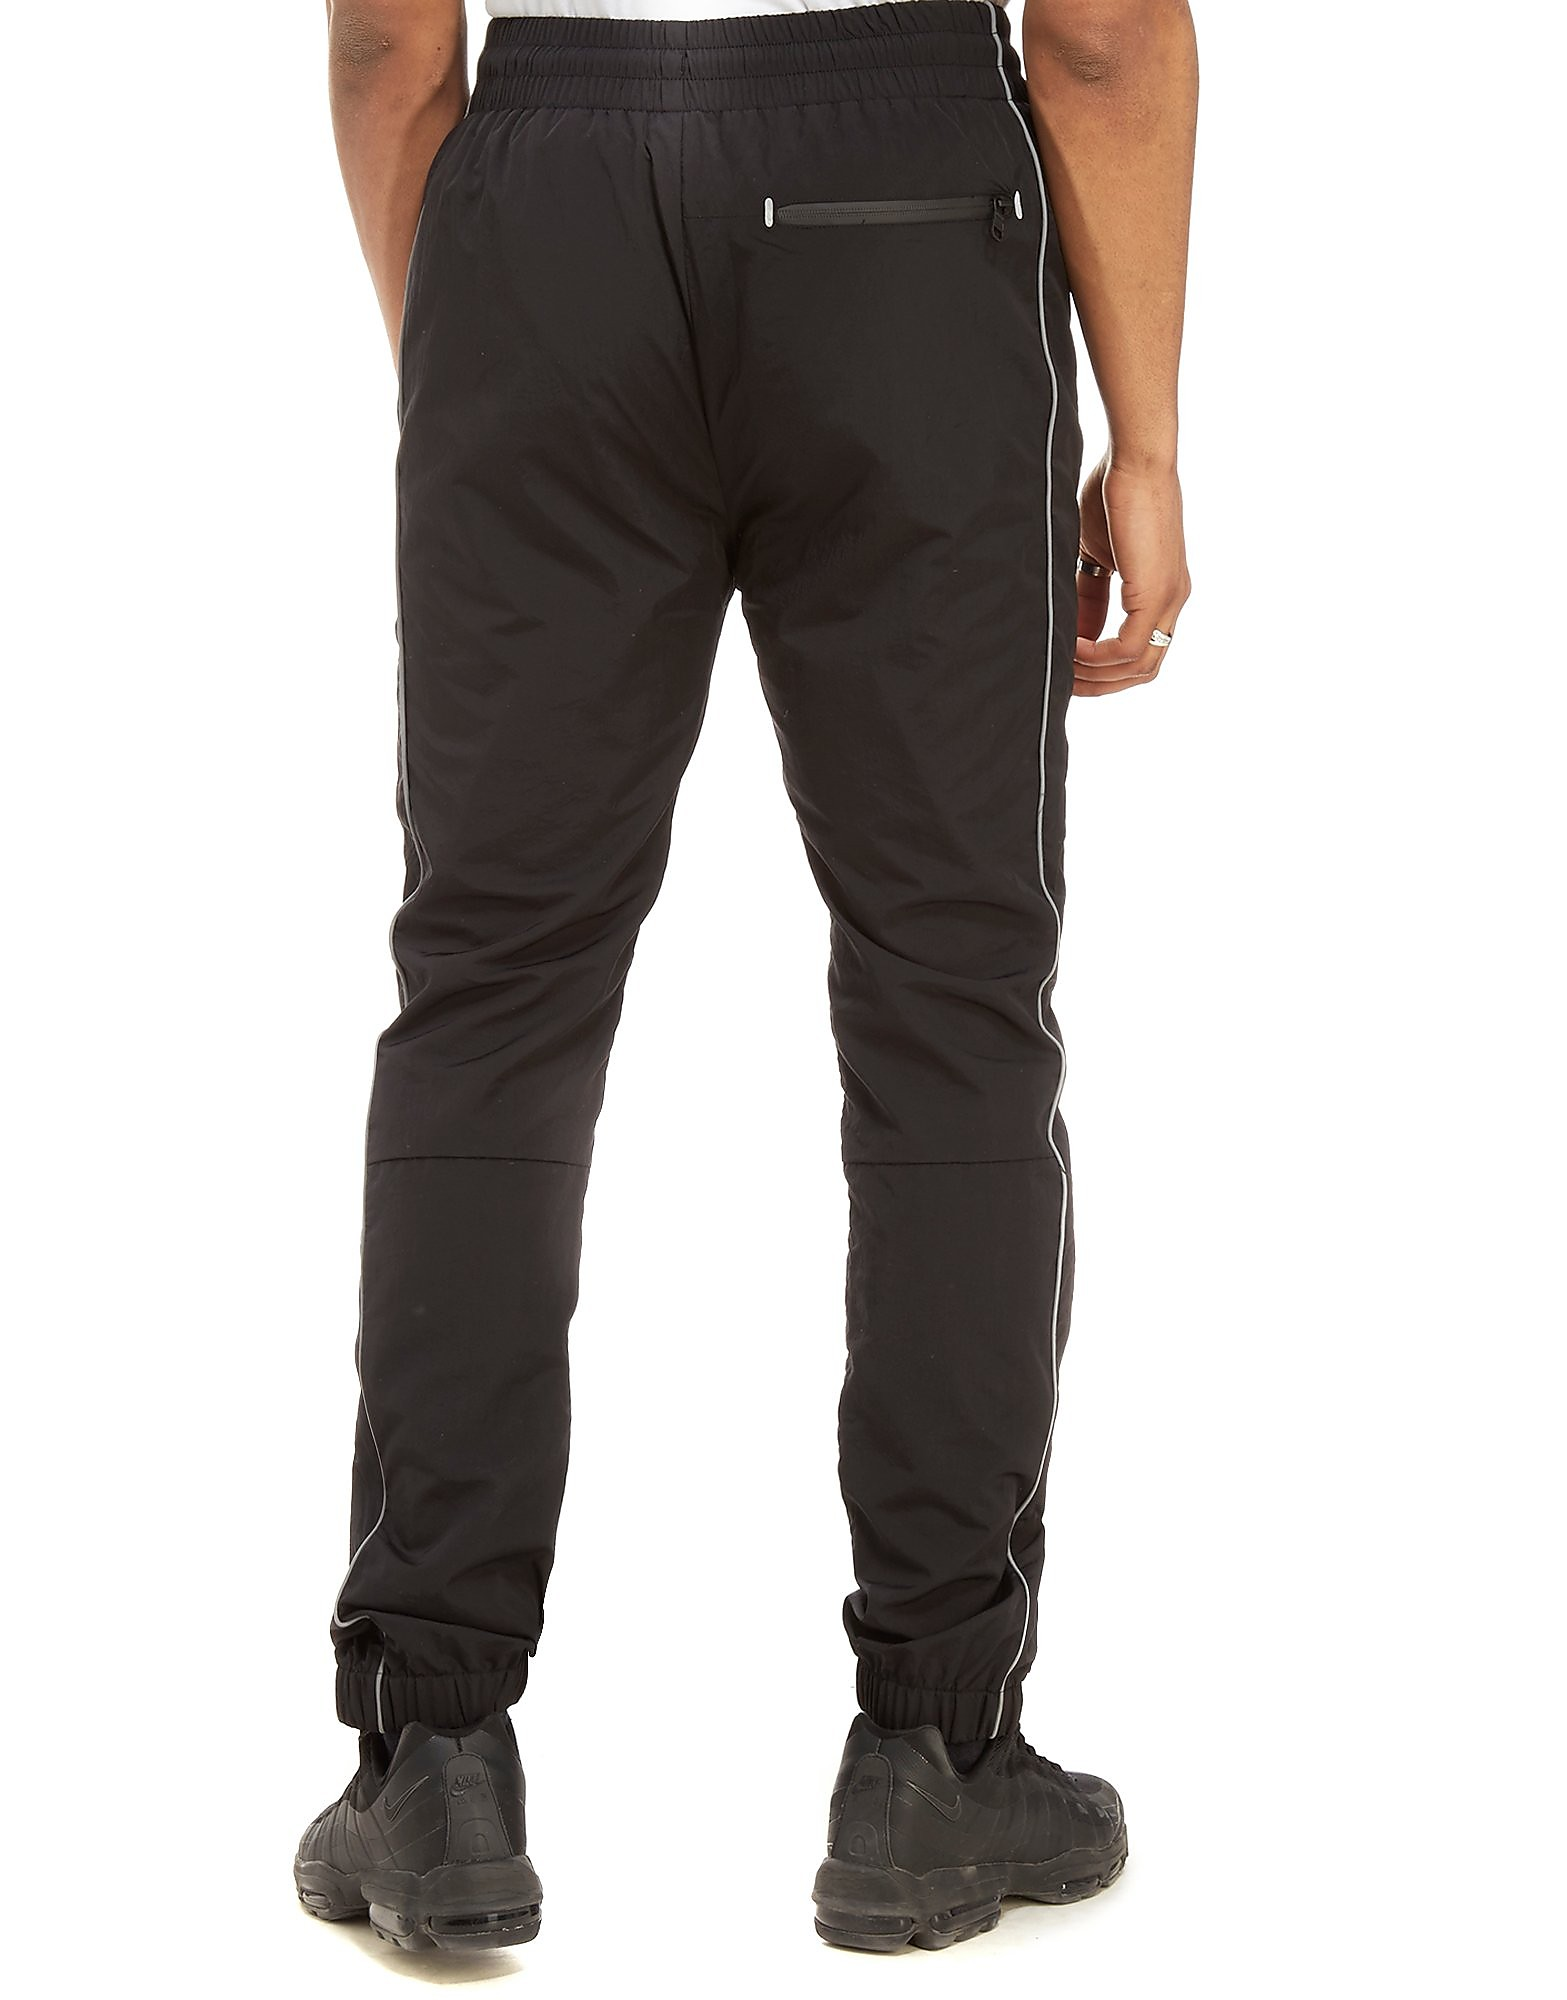 Align Glider Woven Pants